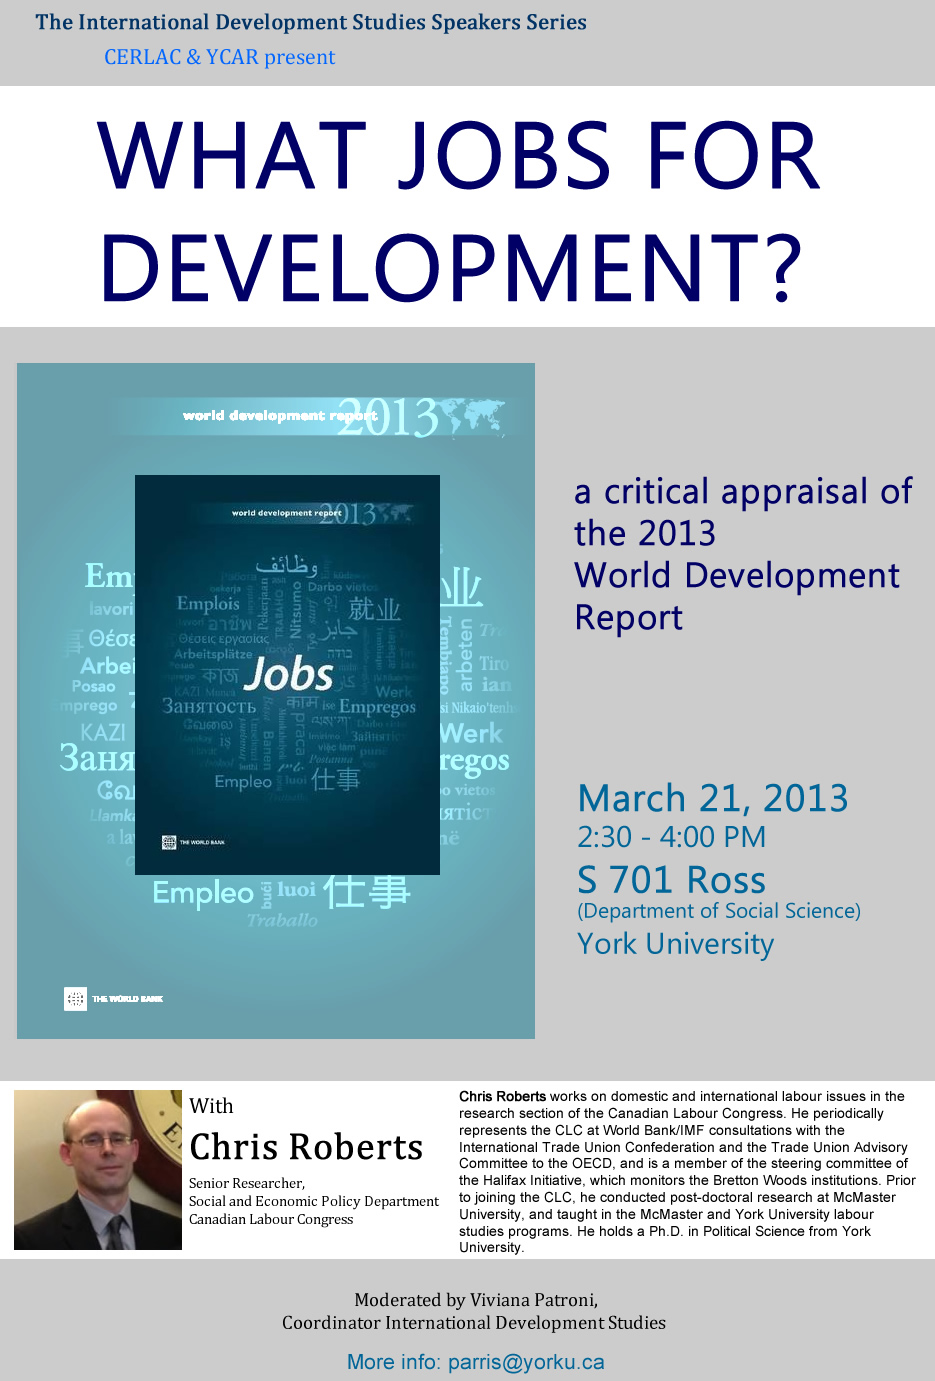 What jobs for development